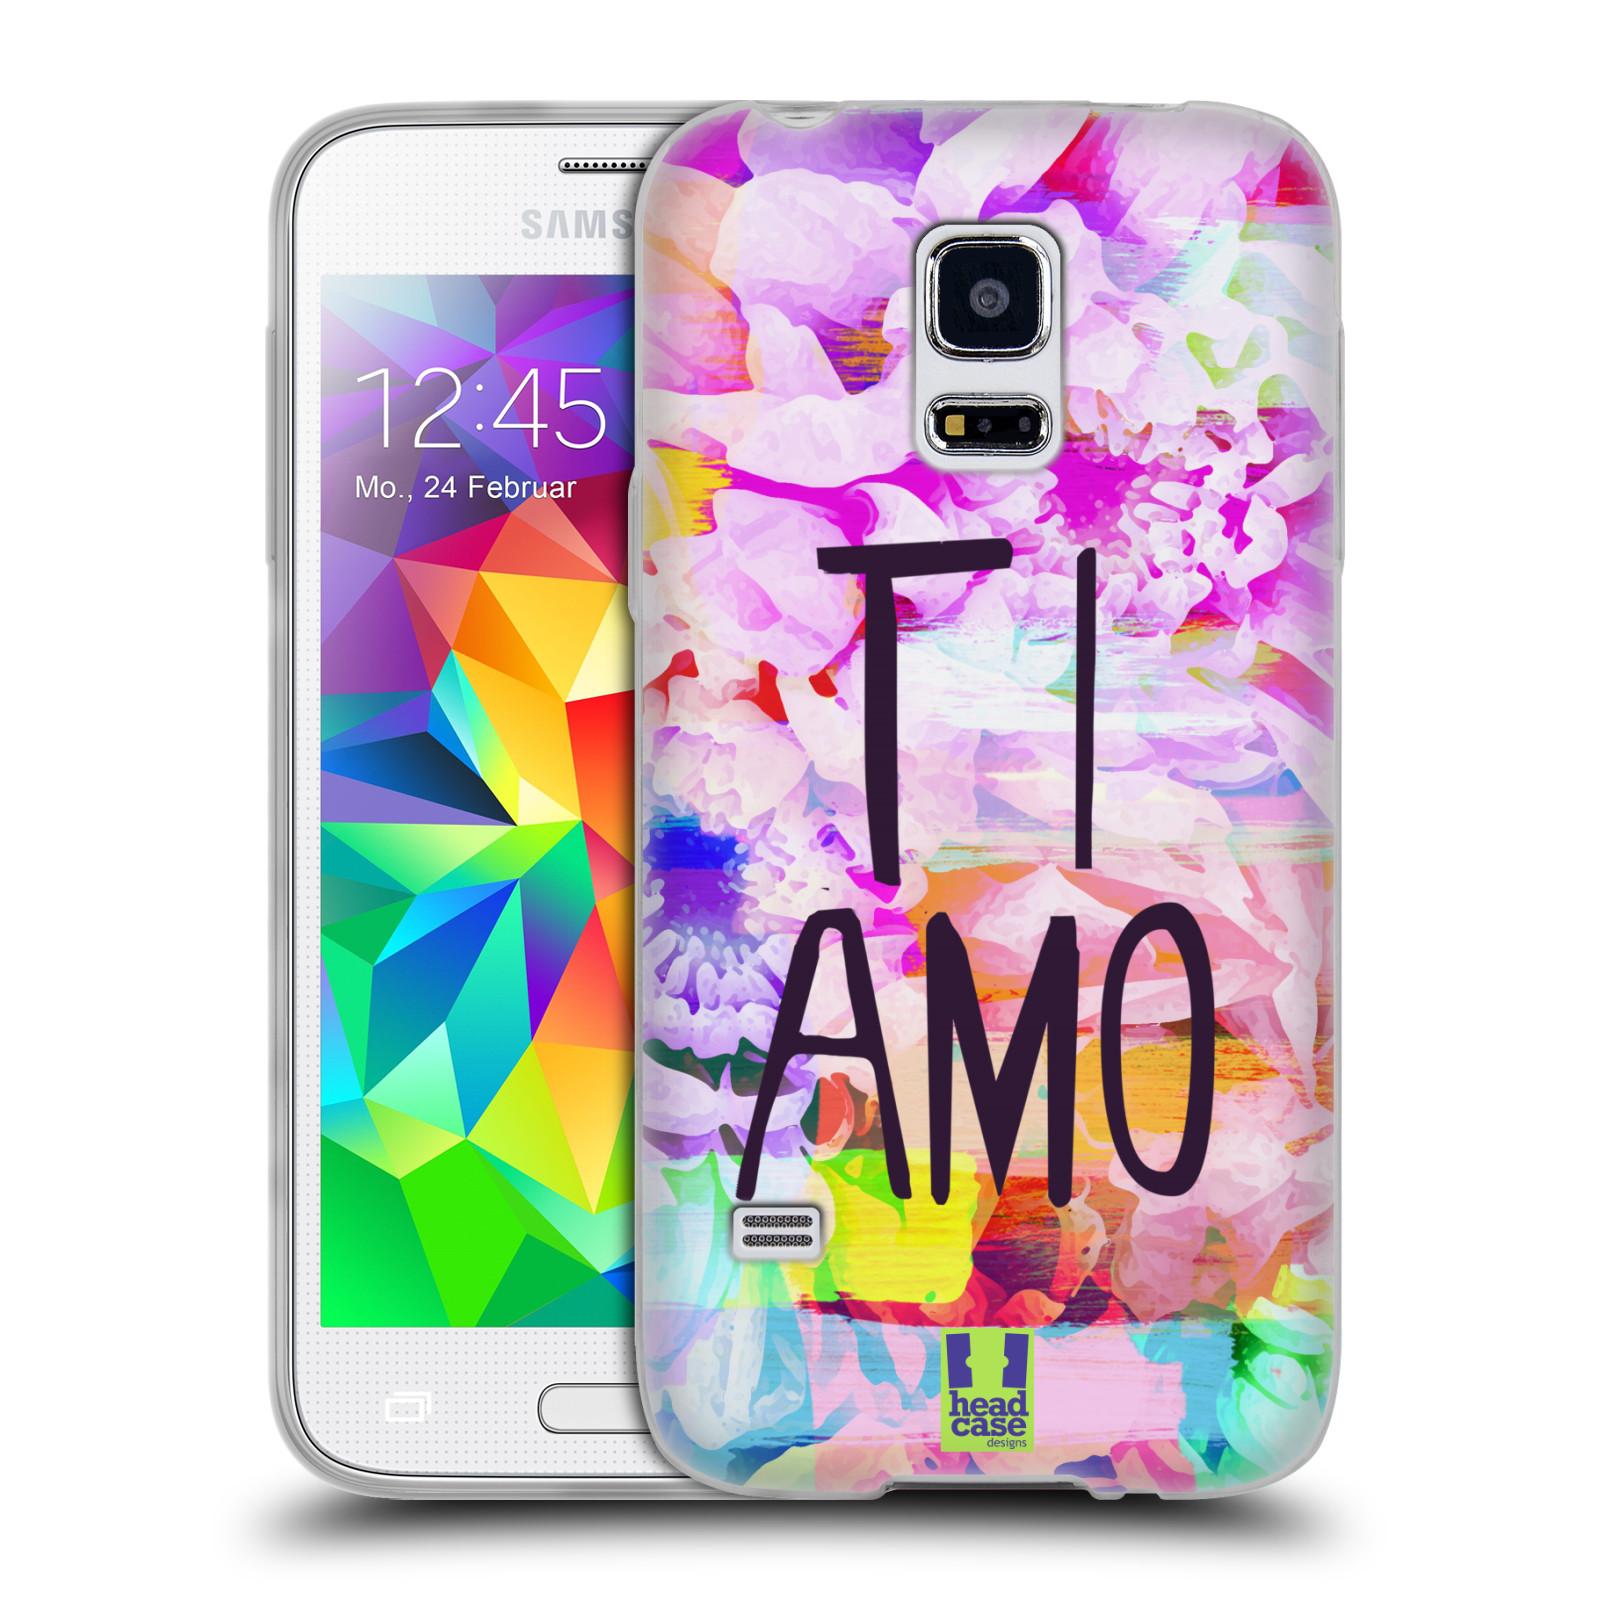 HEAD CASE silikonový obal na mobil Samsung Galaxy S5 MINI   S5 MINI DUOS  Láska a květy Ti Amo 120c5539bda